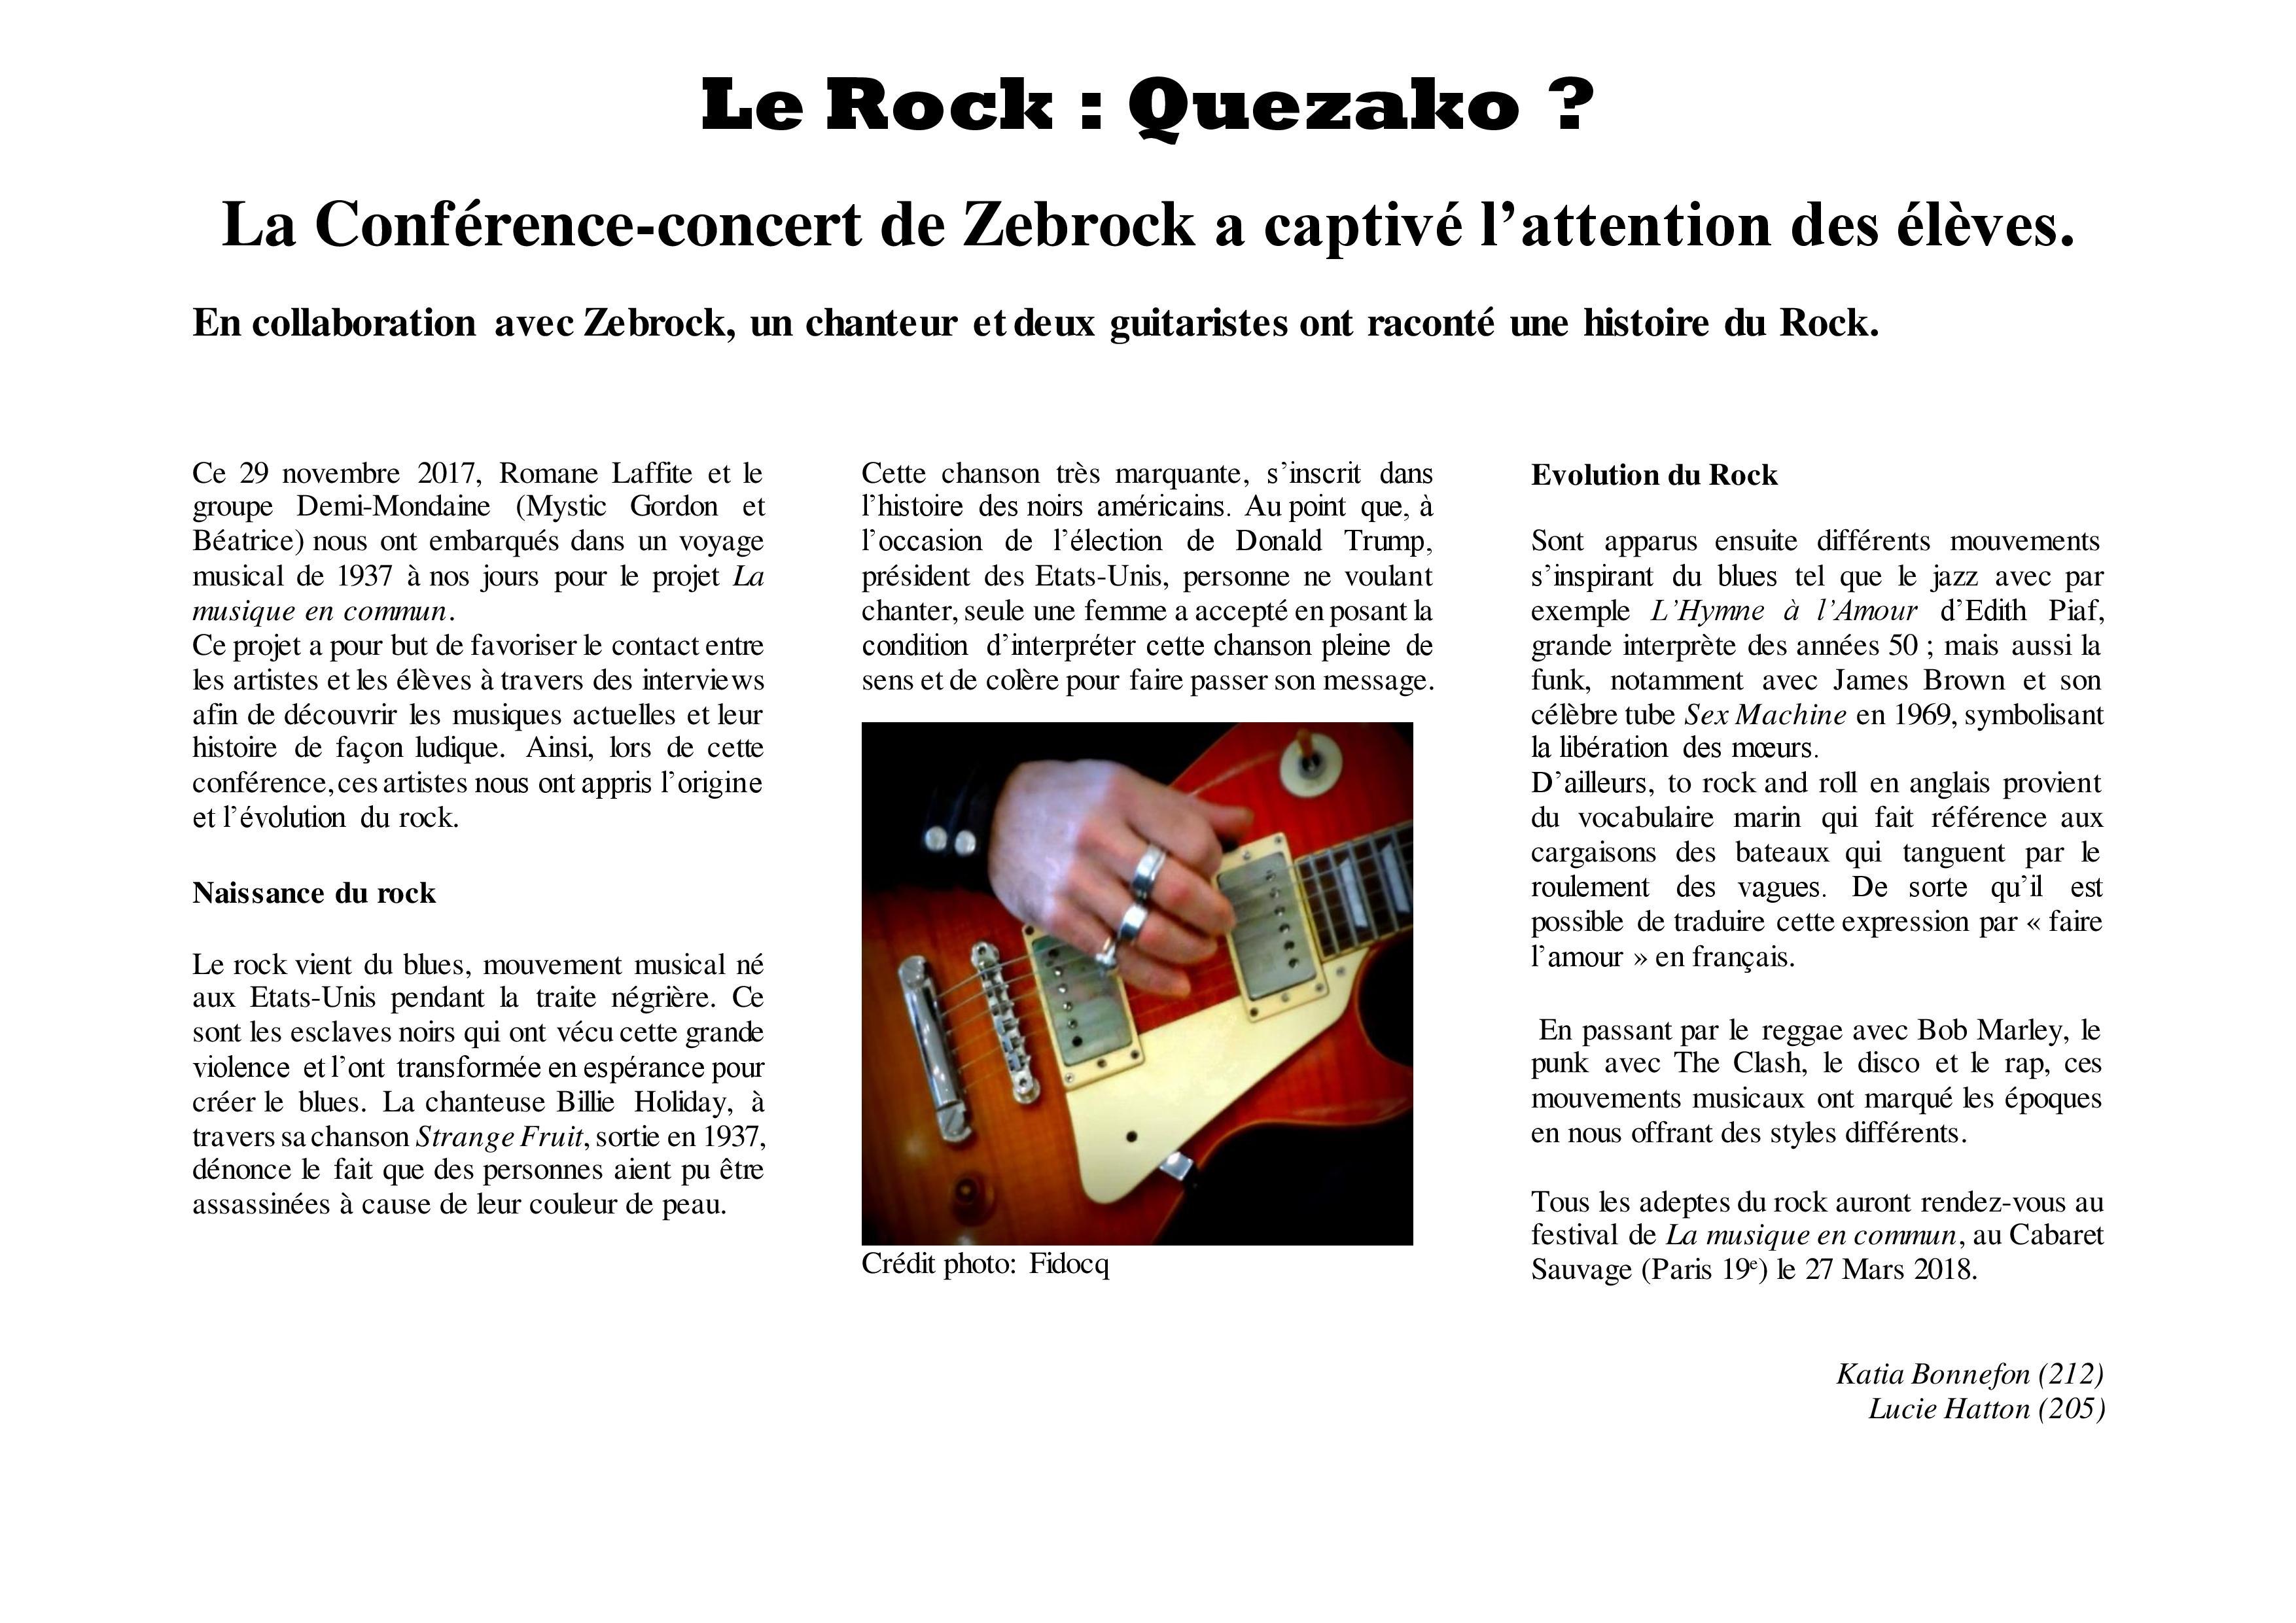 Le Rock pdf-page-001